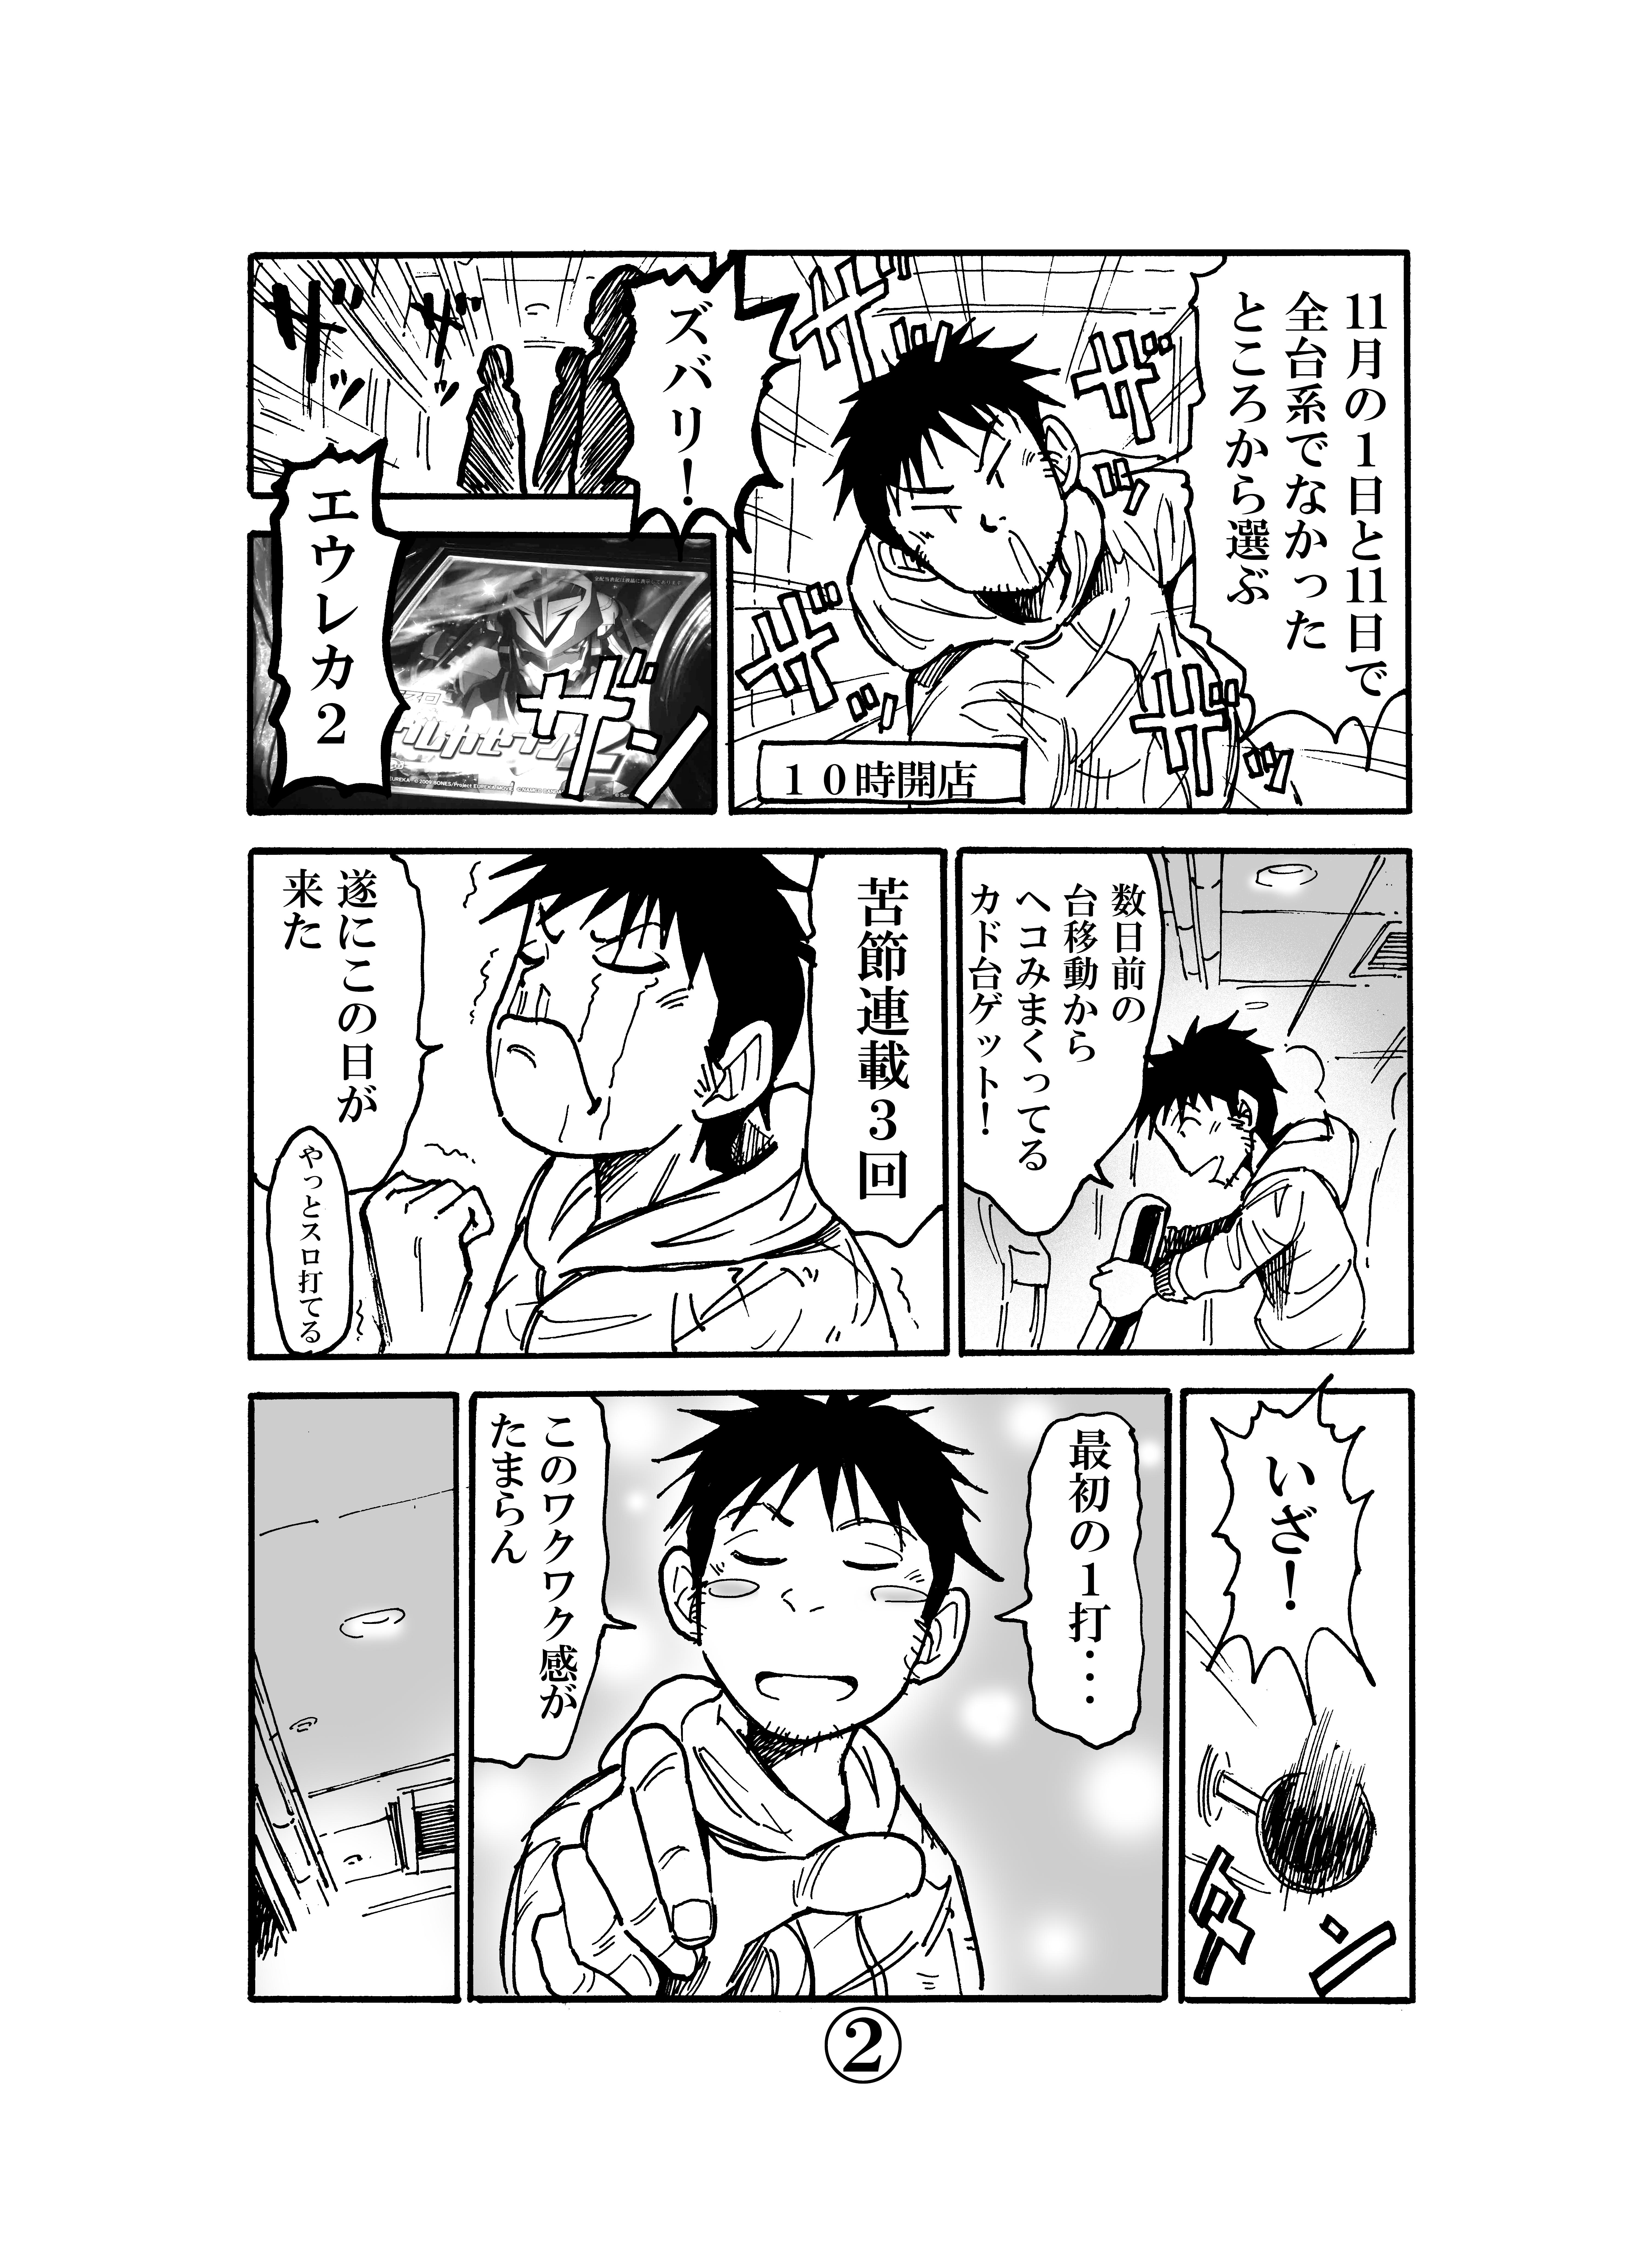 11/21②